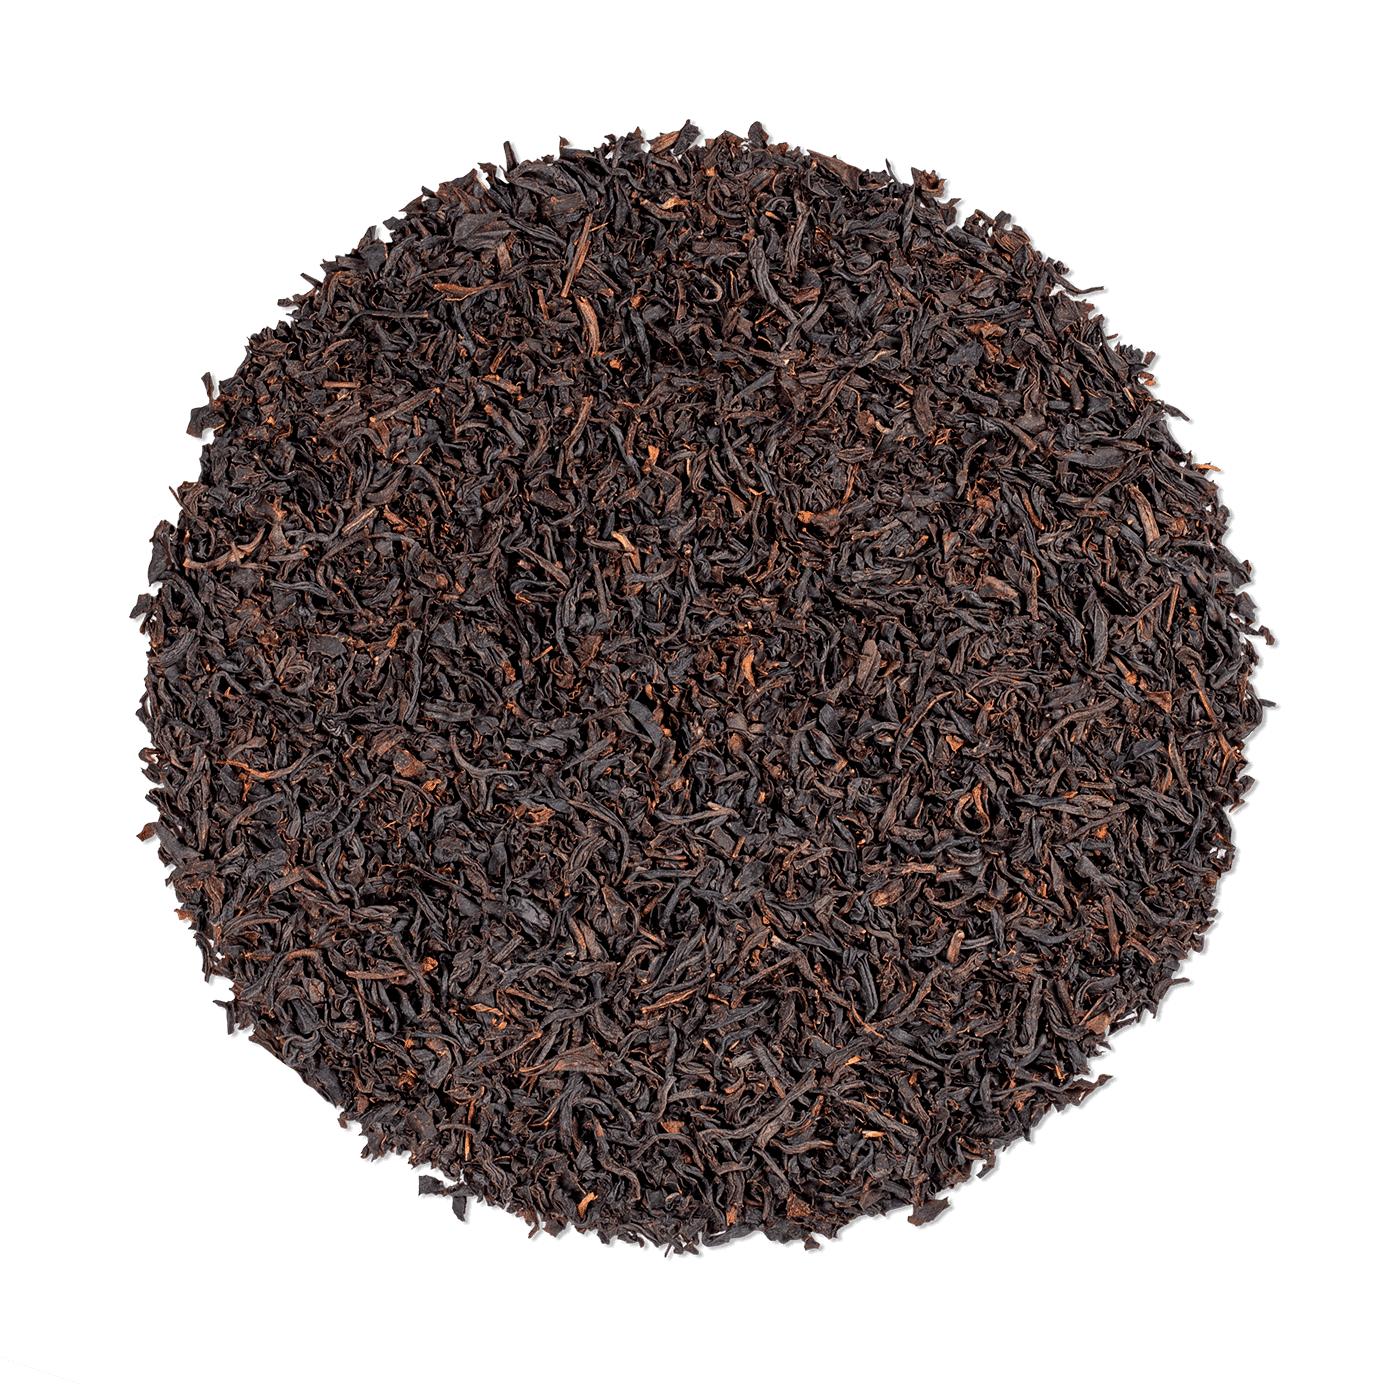 KUSMI TEA Earl Grey bio - Thé noir, bergamote - Thé en vrac - Kusmi Tea